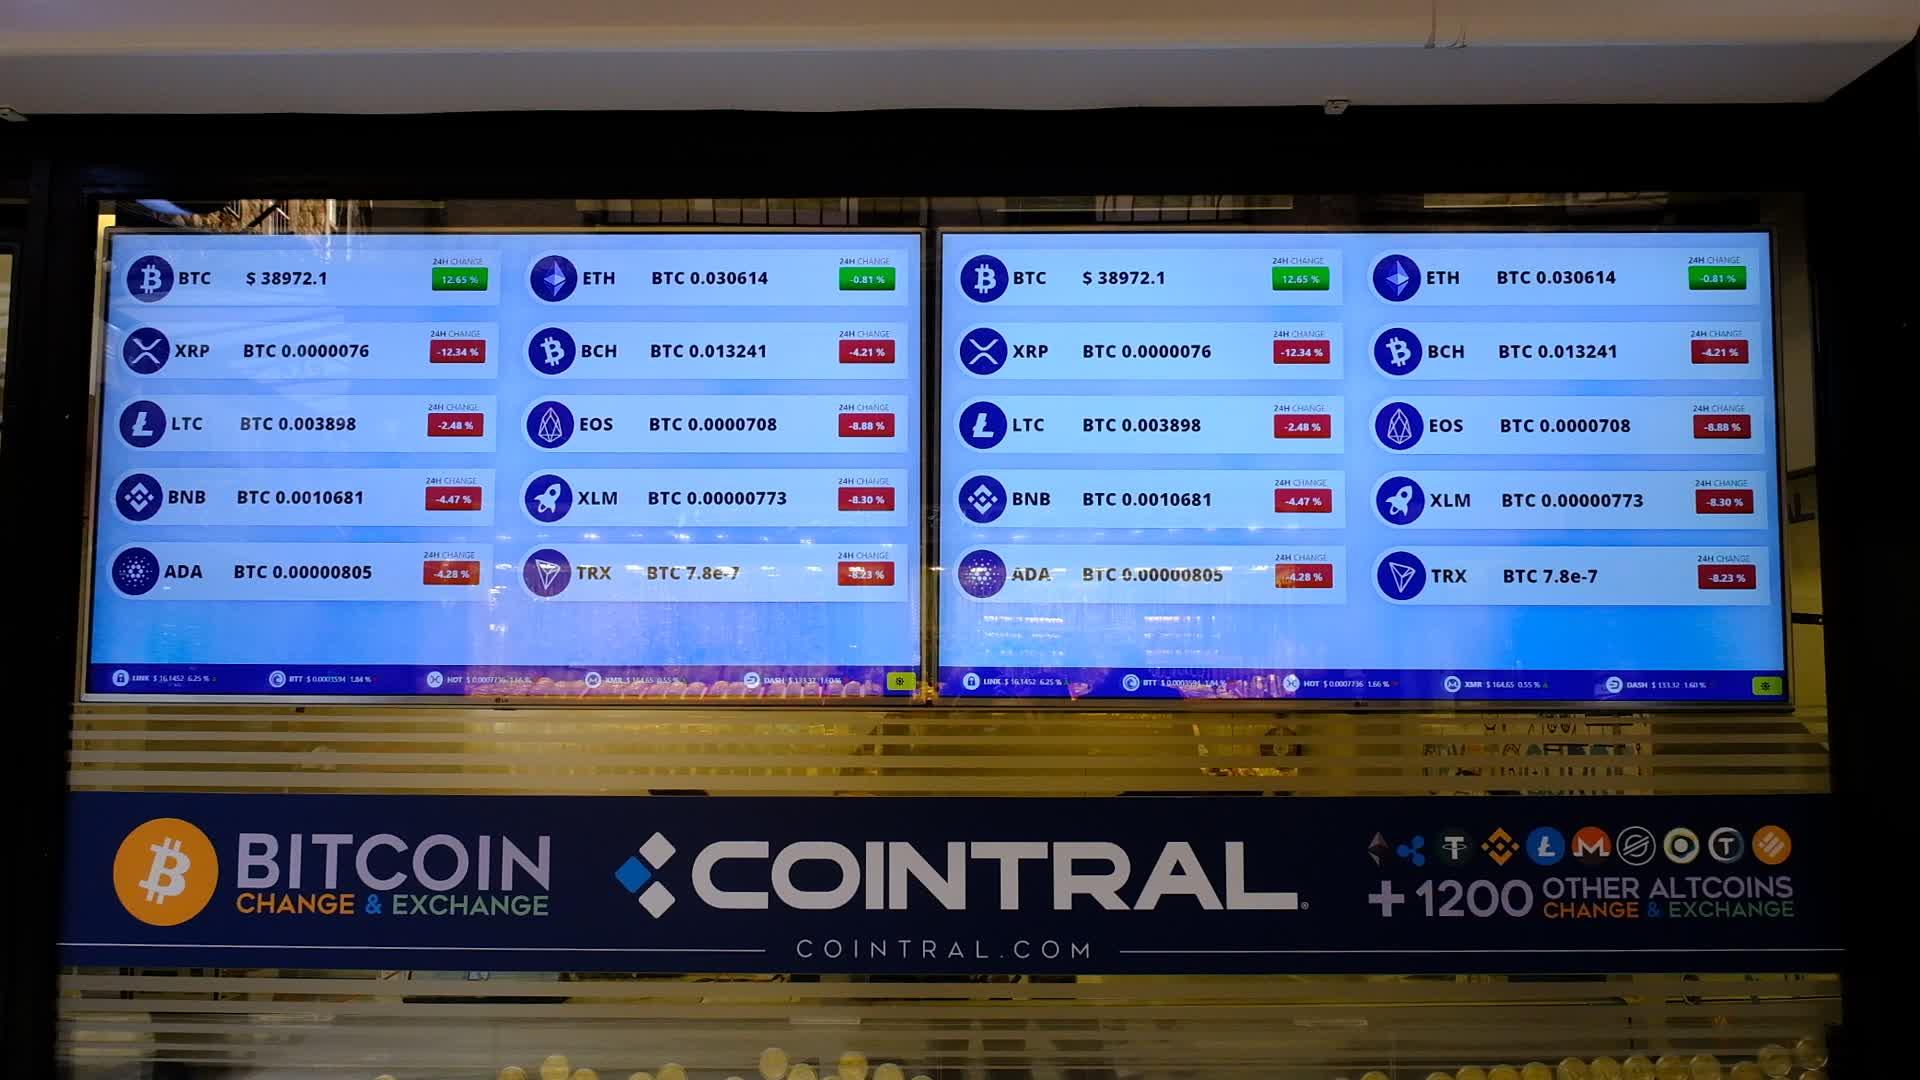 Bitcoin exchange office